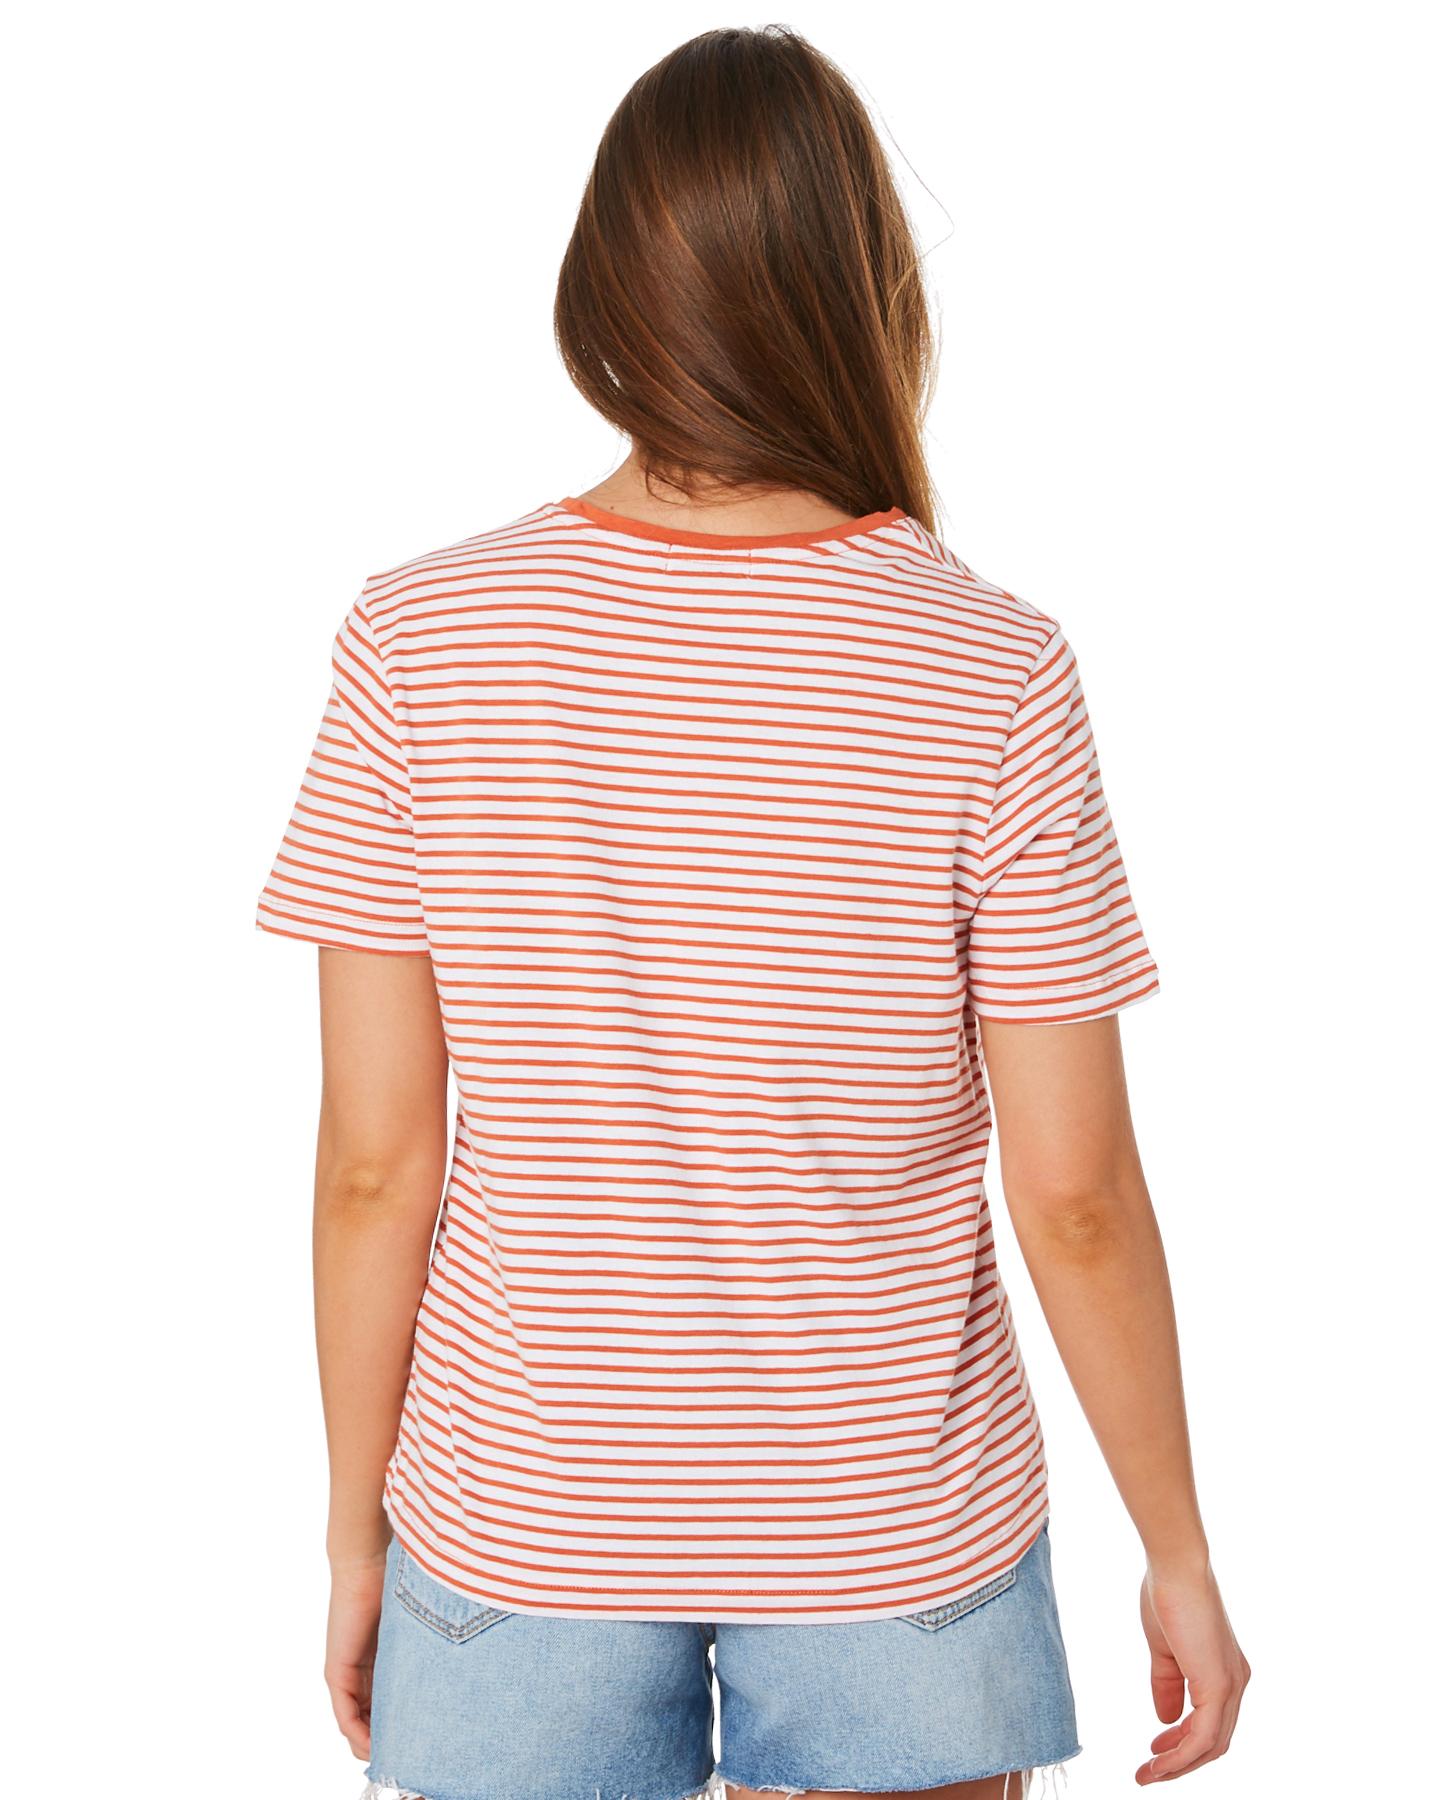 New-Swell-Women-039-s-Jesse-Stripe-Tee-Crew-Neck-Short-Sleeve-Cotton thumbnail 13